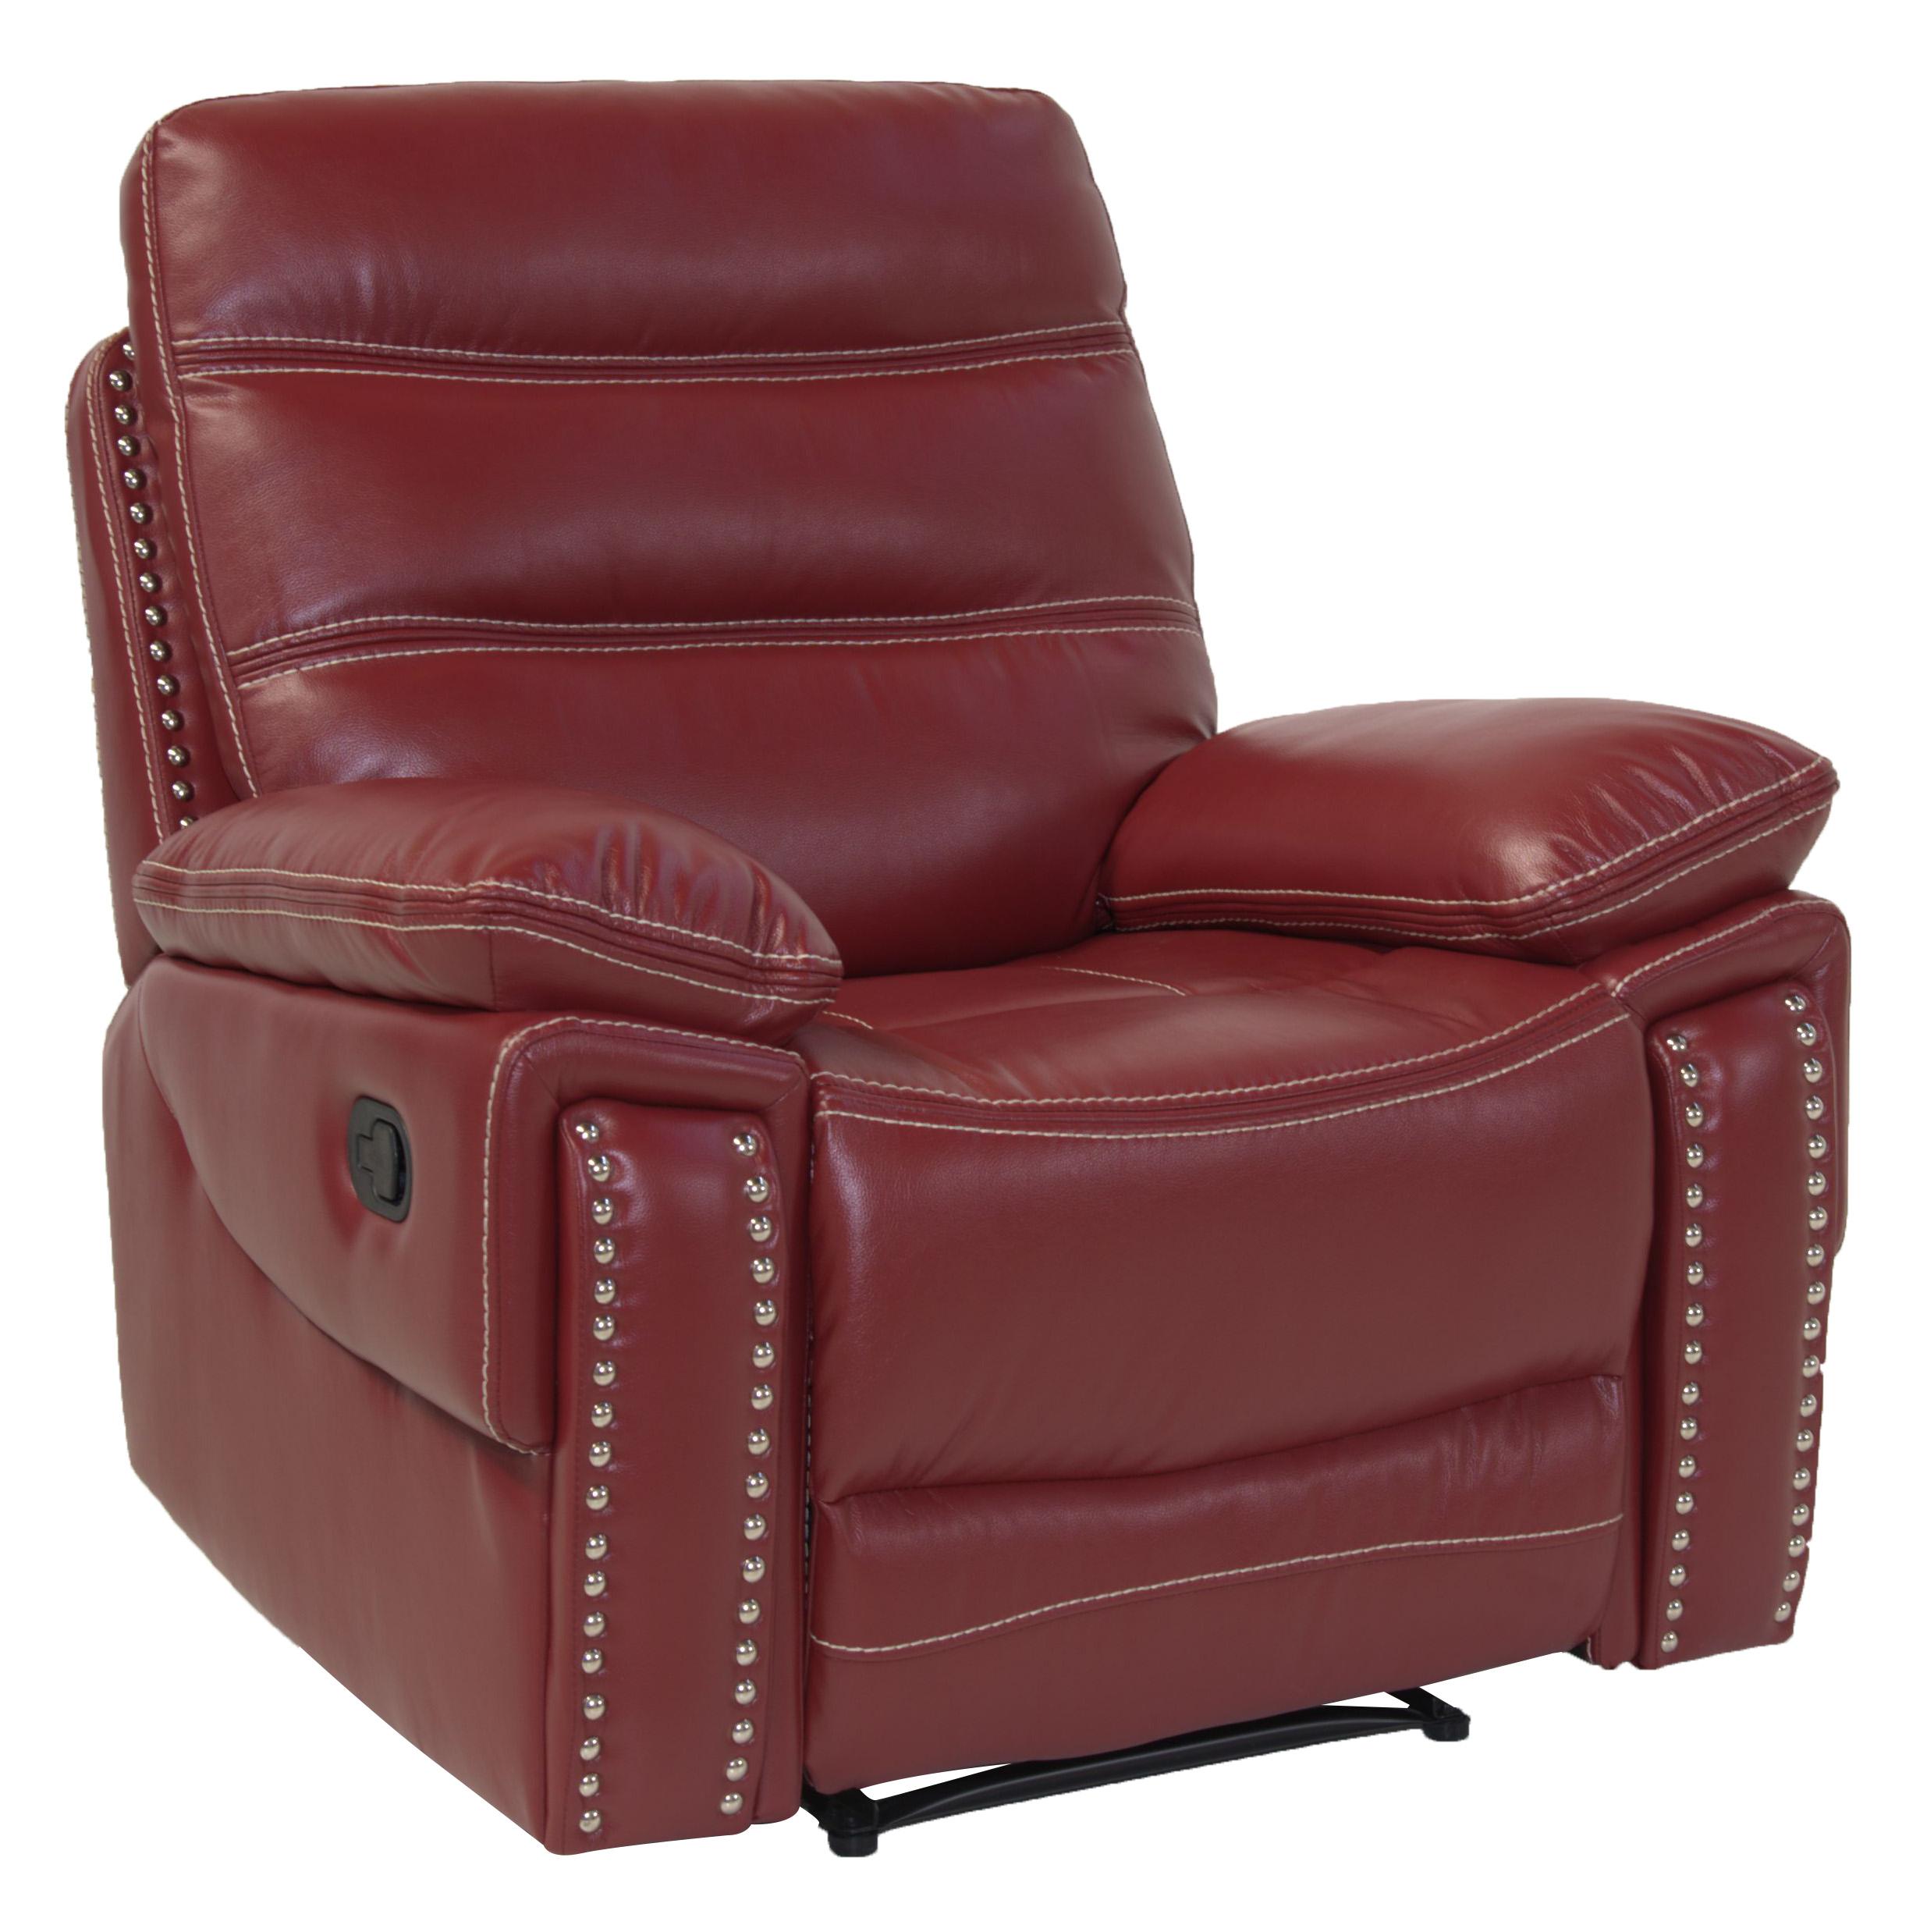 Arf001 Recliner Lounge Suite Furniture Liquidation Warehouse